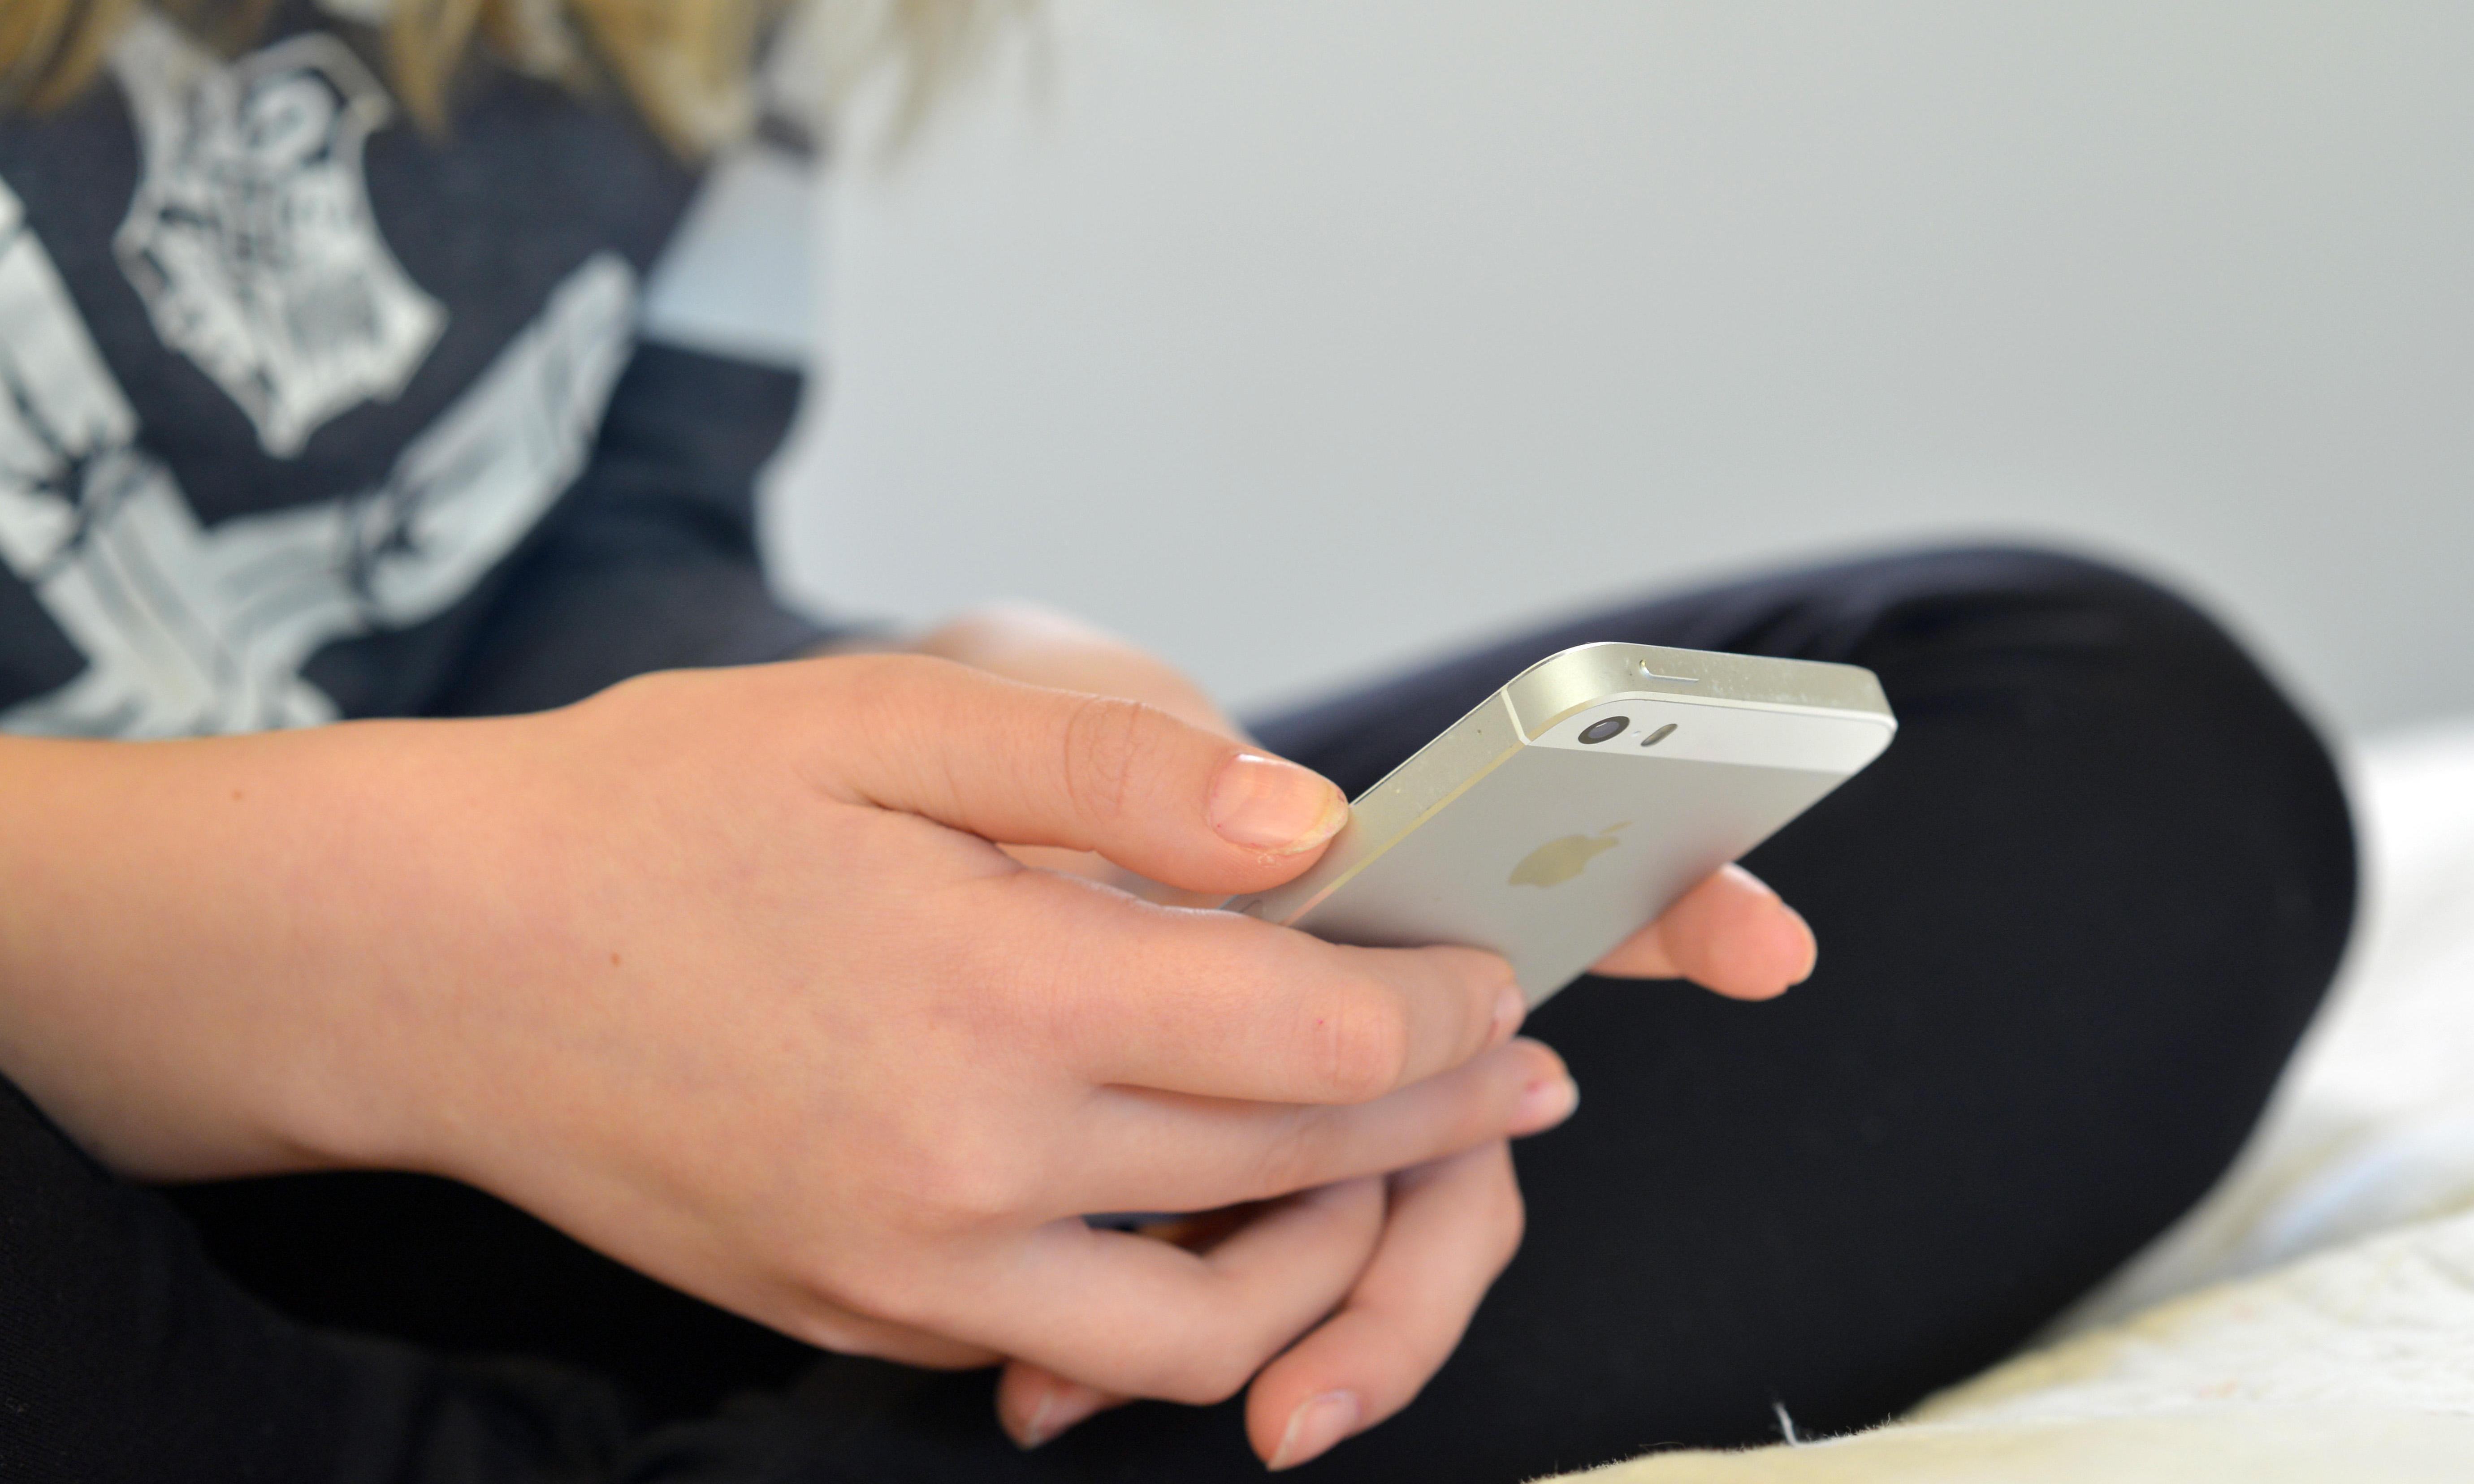 Impact of social media on children faces fresh scrutiny